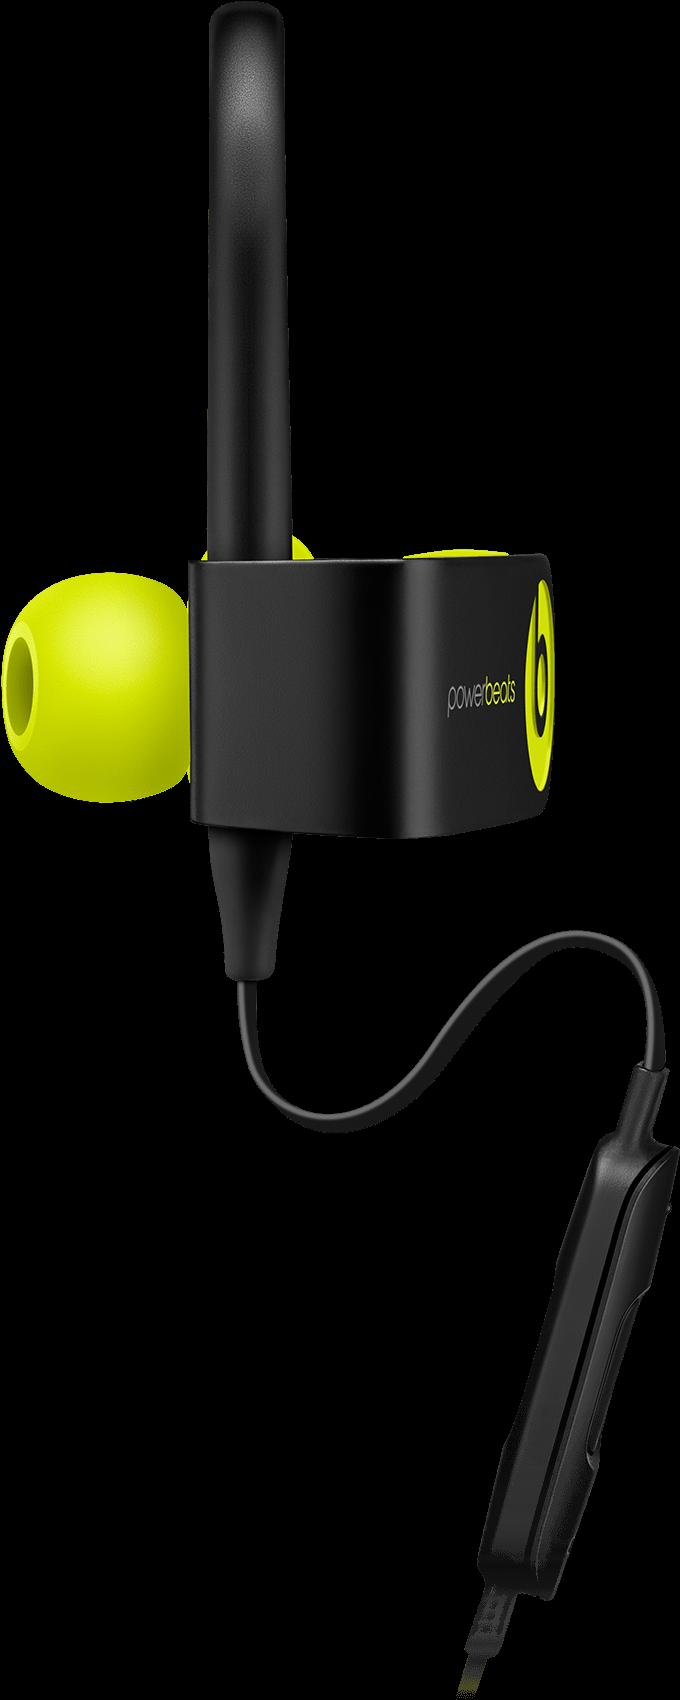 Download HD Audio & Sound - Apple Beats Powerbeats3 Transparent PNG